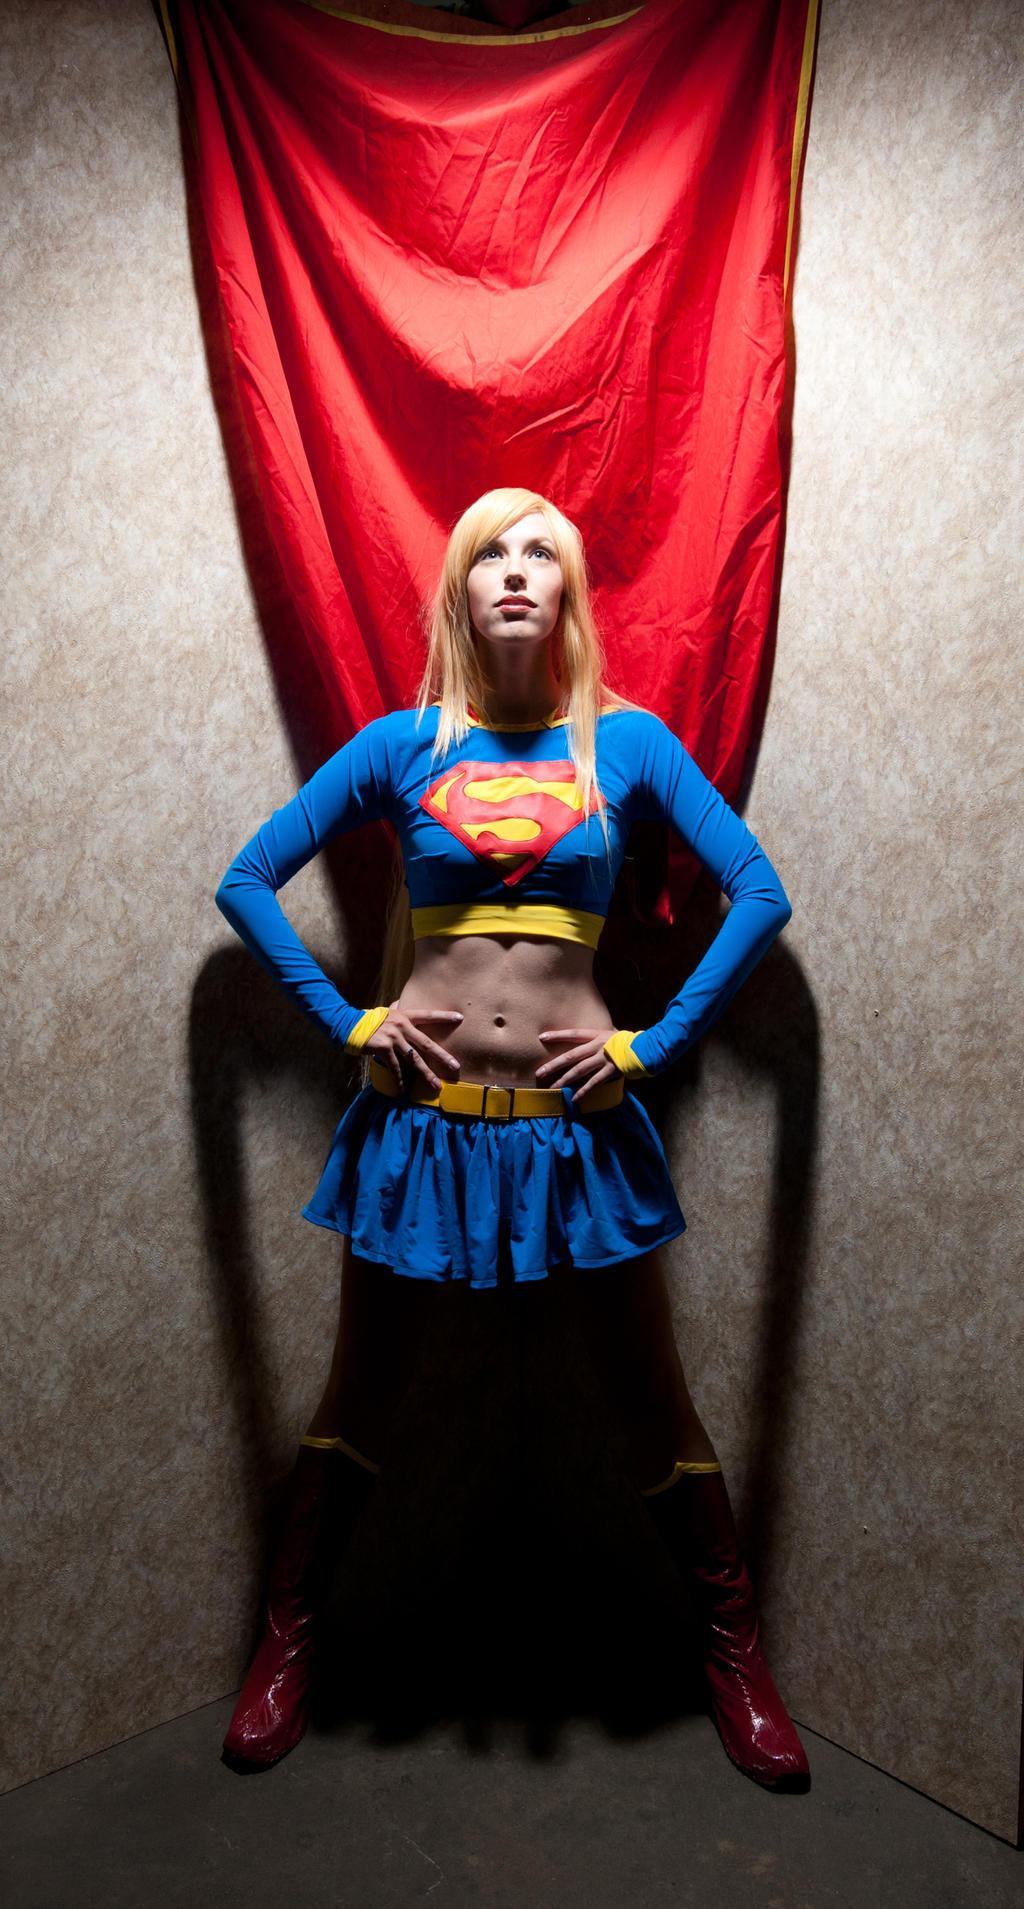 Tali Supergirl 7a by jagged-eye